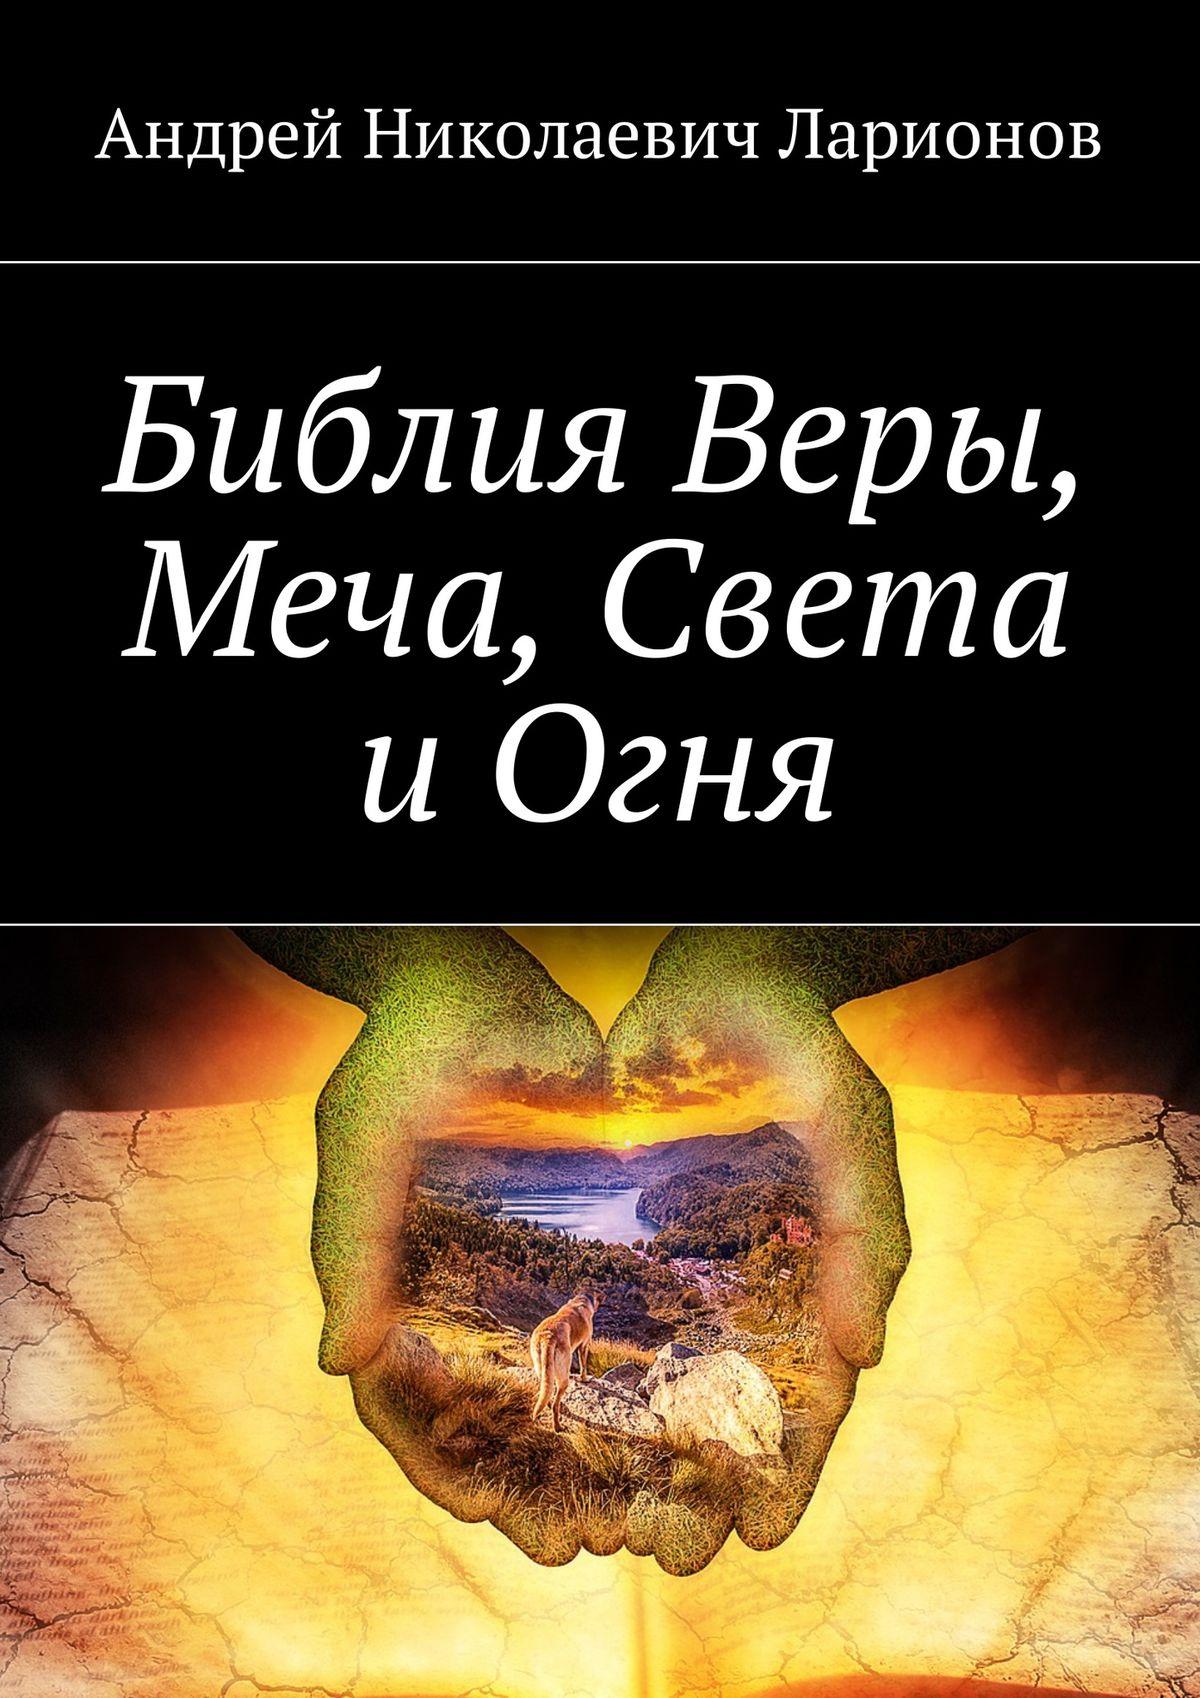 Андрей Николаевич Ларионов Библия Веры, Меча, Света иОгня цена и фото